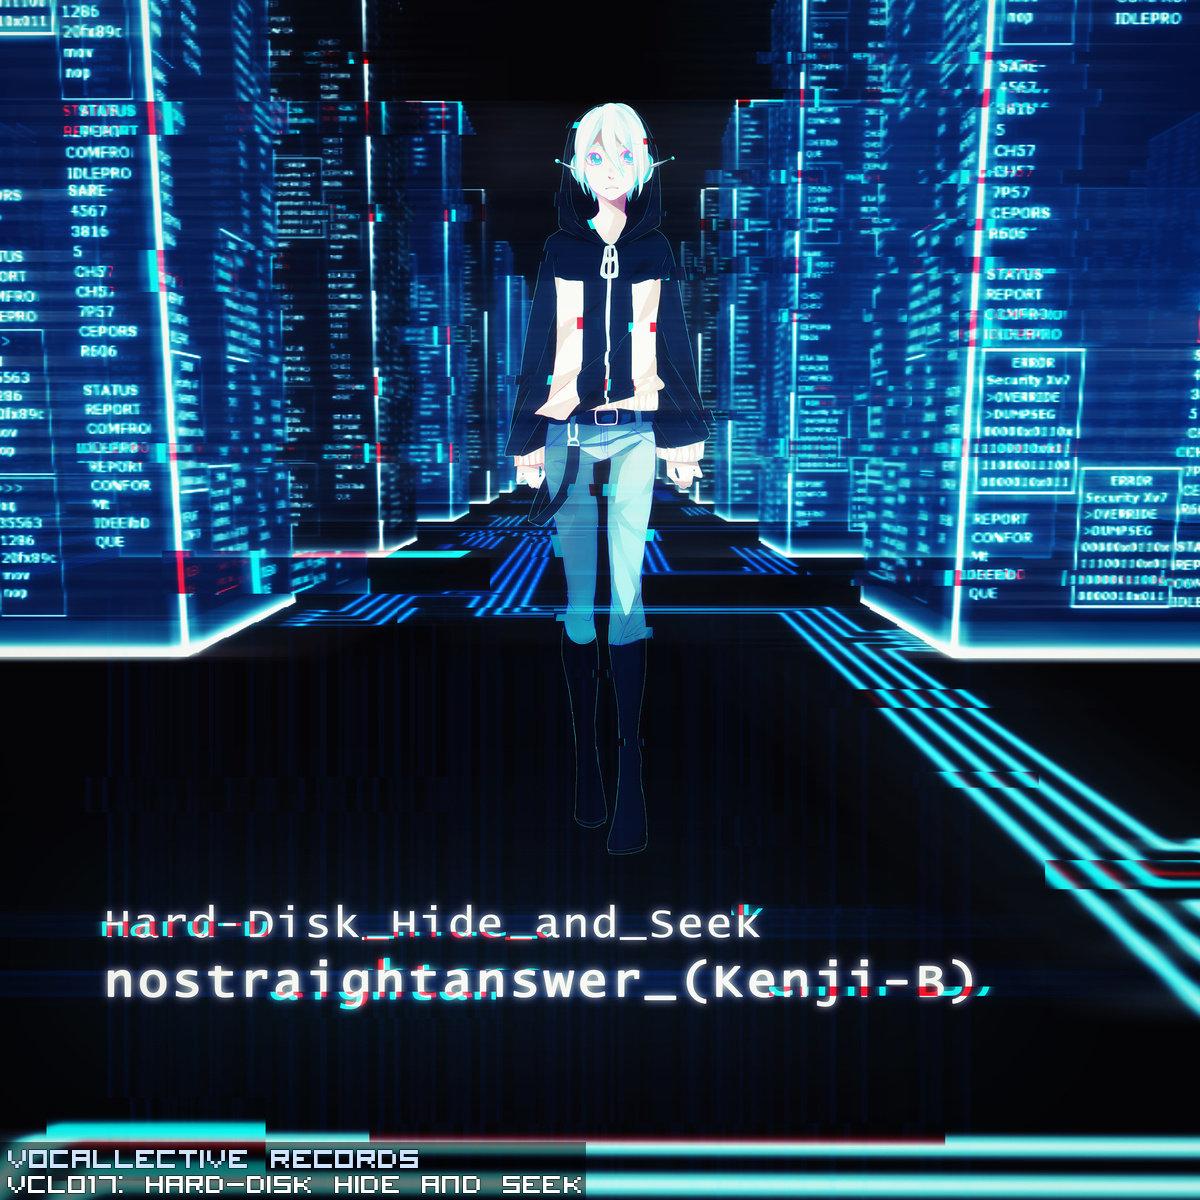 hard-disk_single.jpg